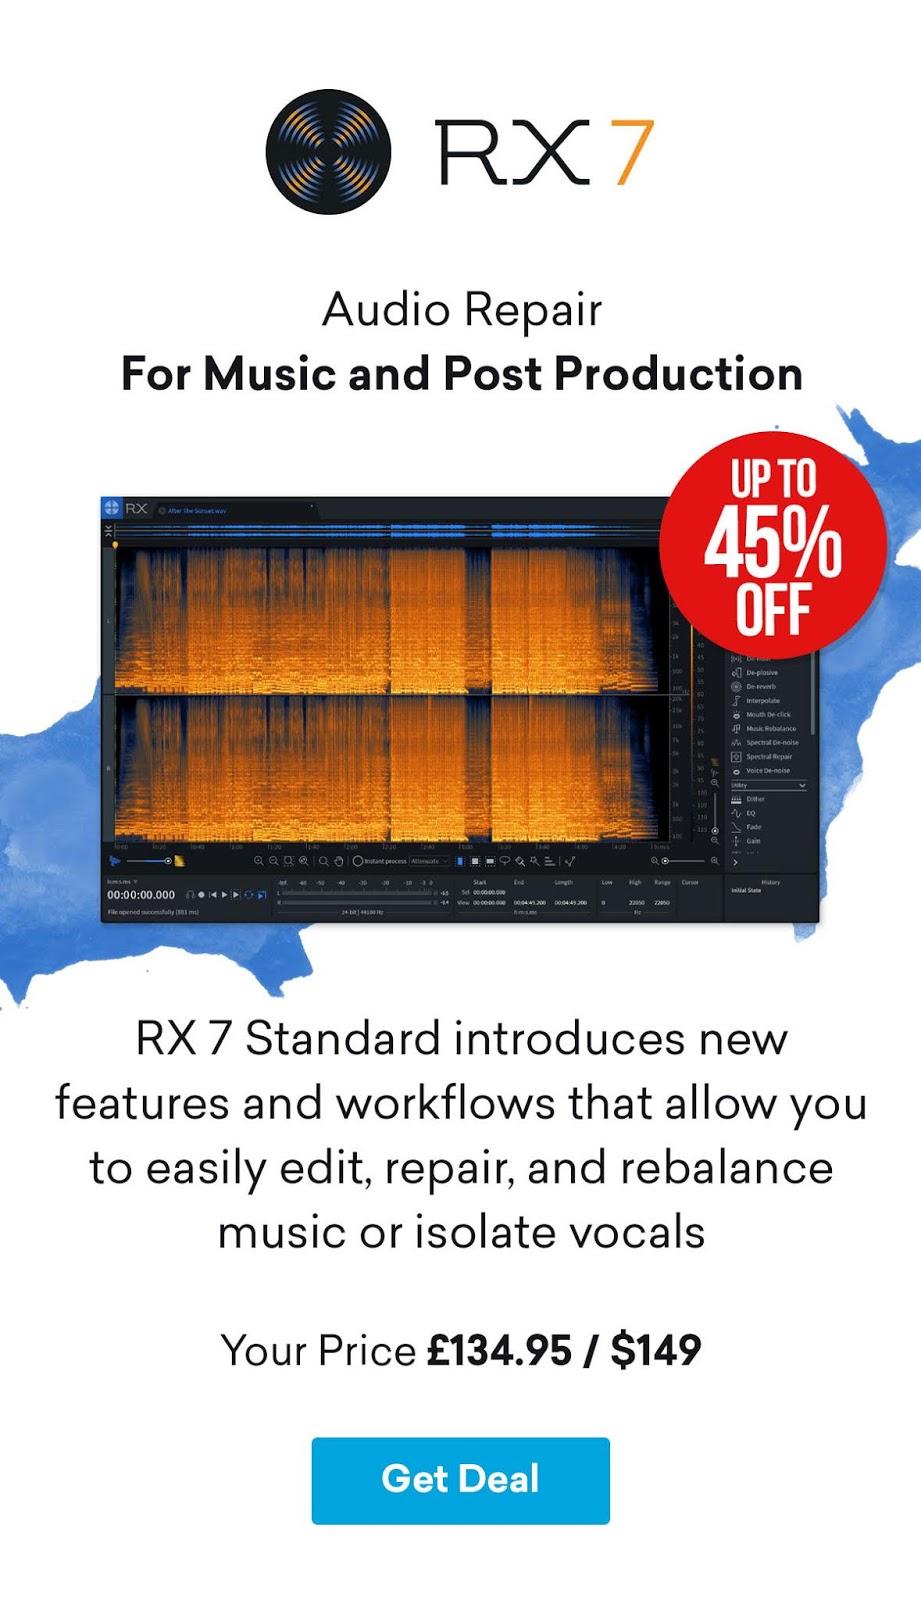 https://www.pluginboutique.com/product/2-Effects/51-Audio-Restoration-/4685-RX-7-Advanced?a_aid=594d72ec243ea&a_bid=ded79e53